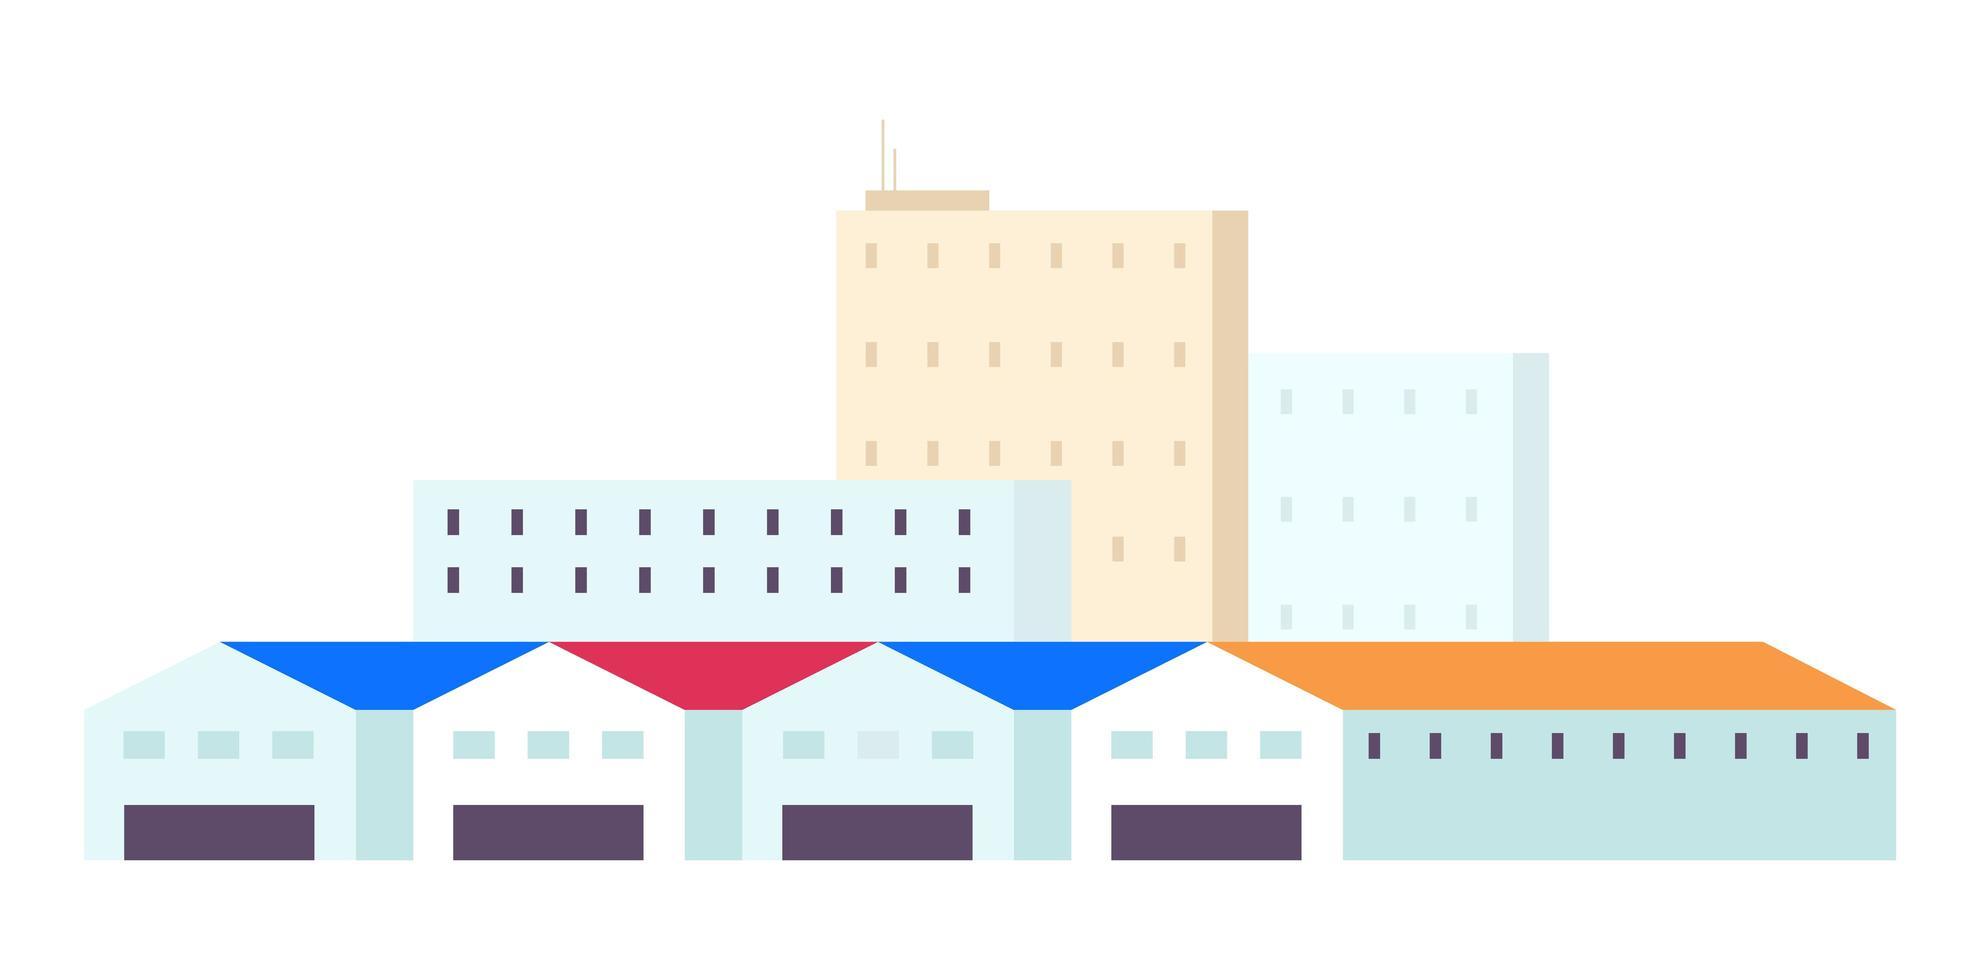 mehrstöckige Gebäude und geräumige Hangars vektor